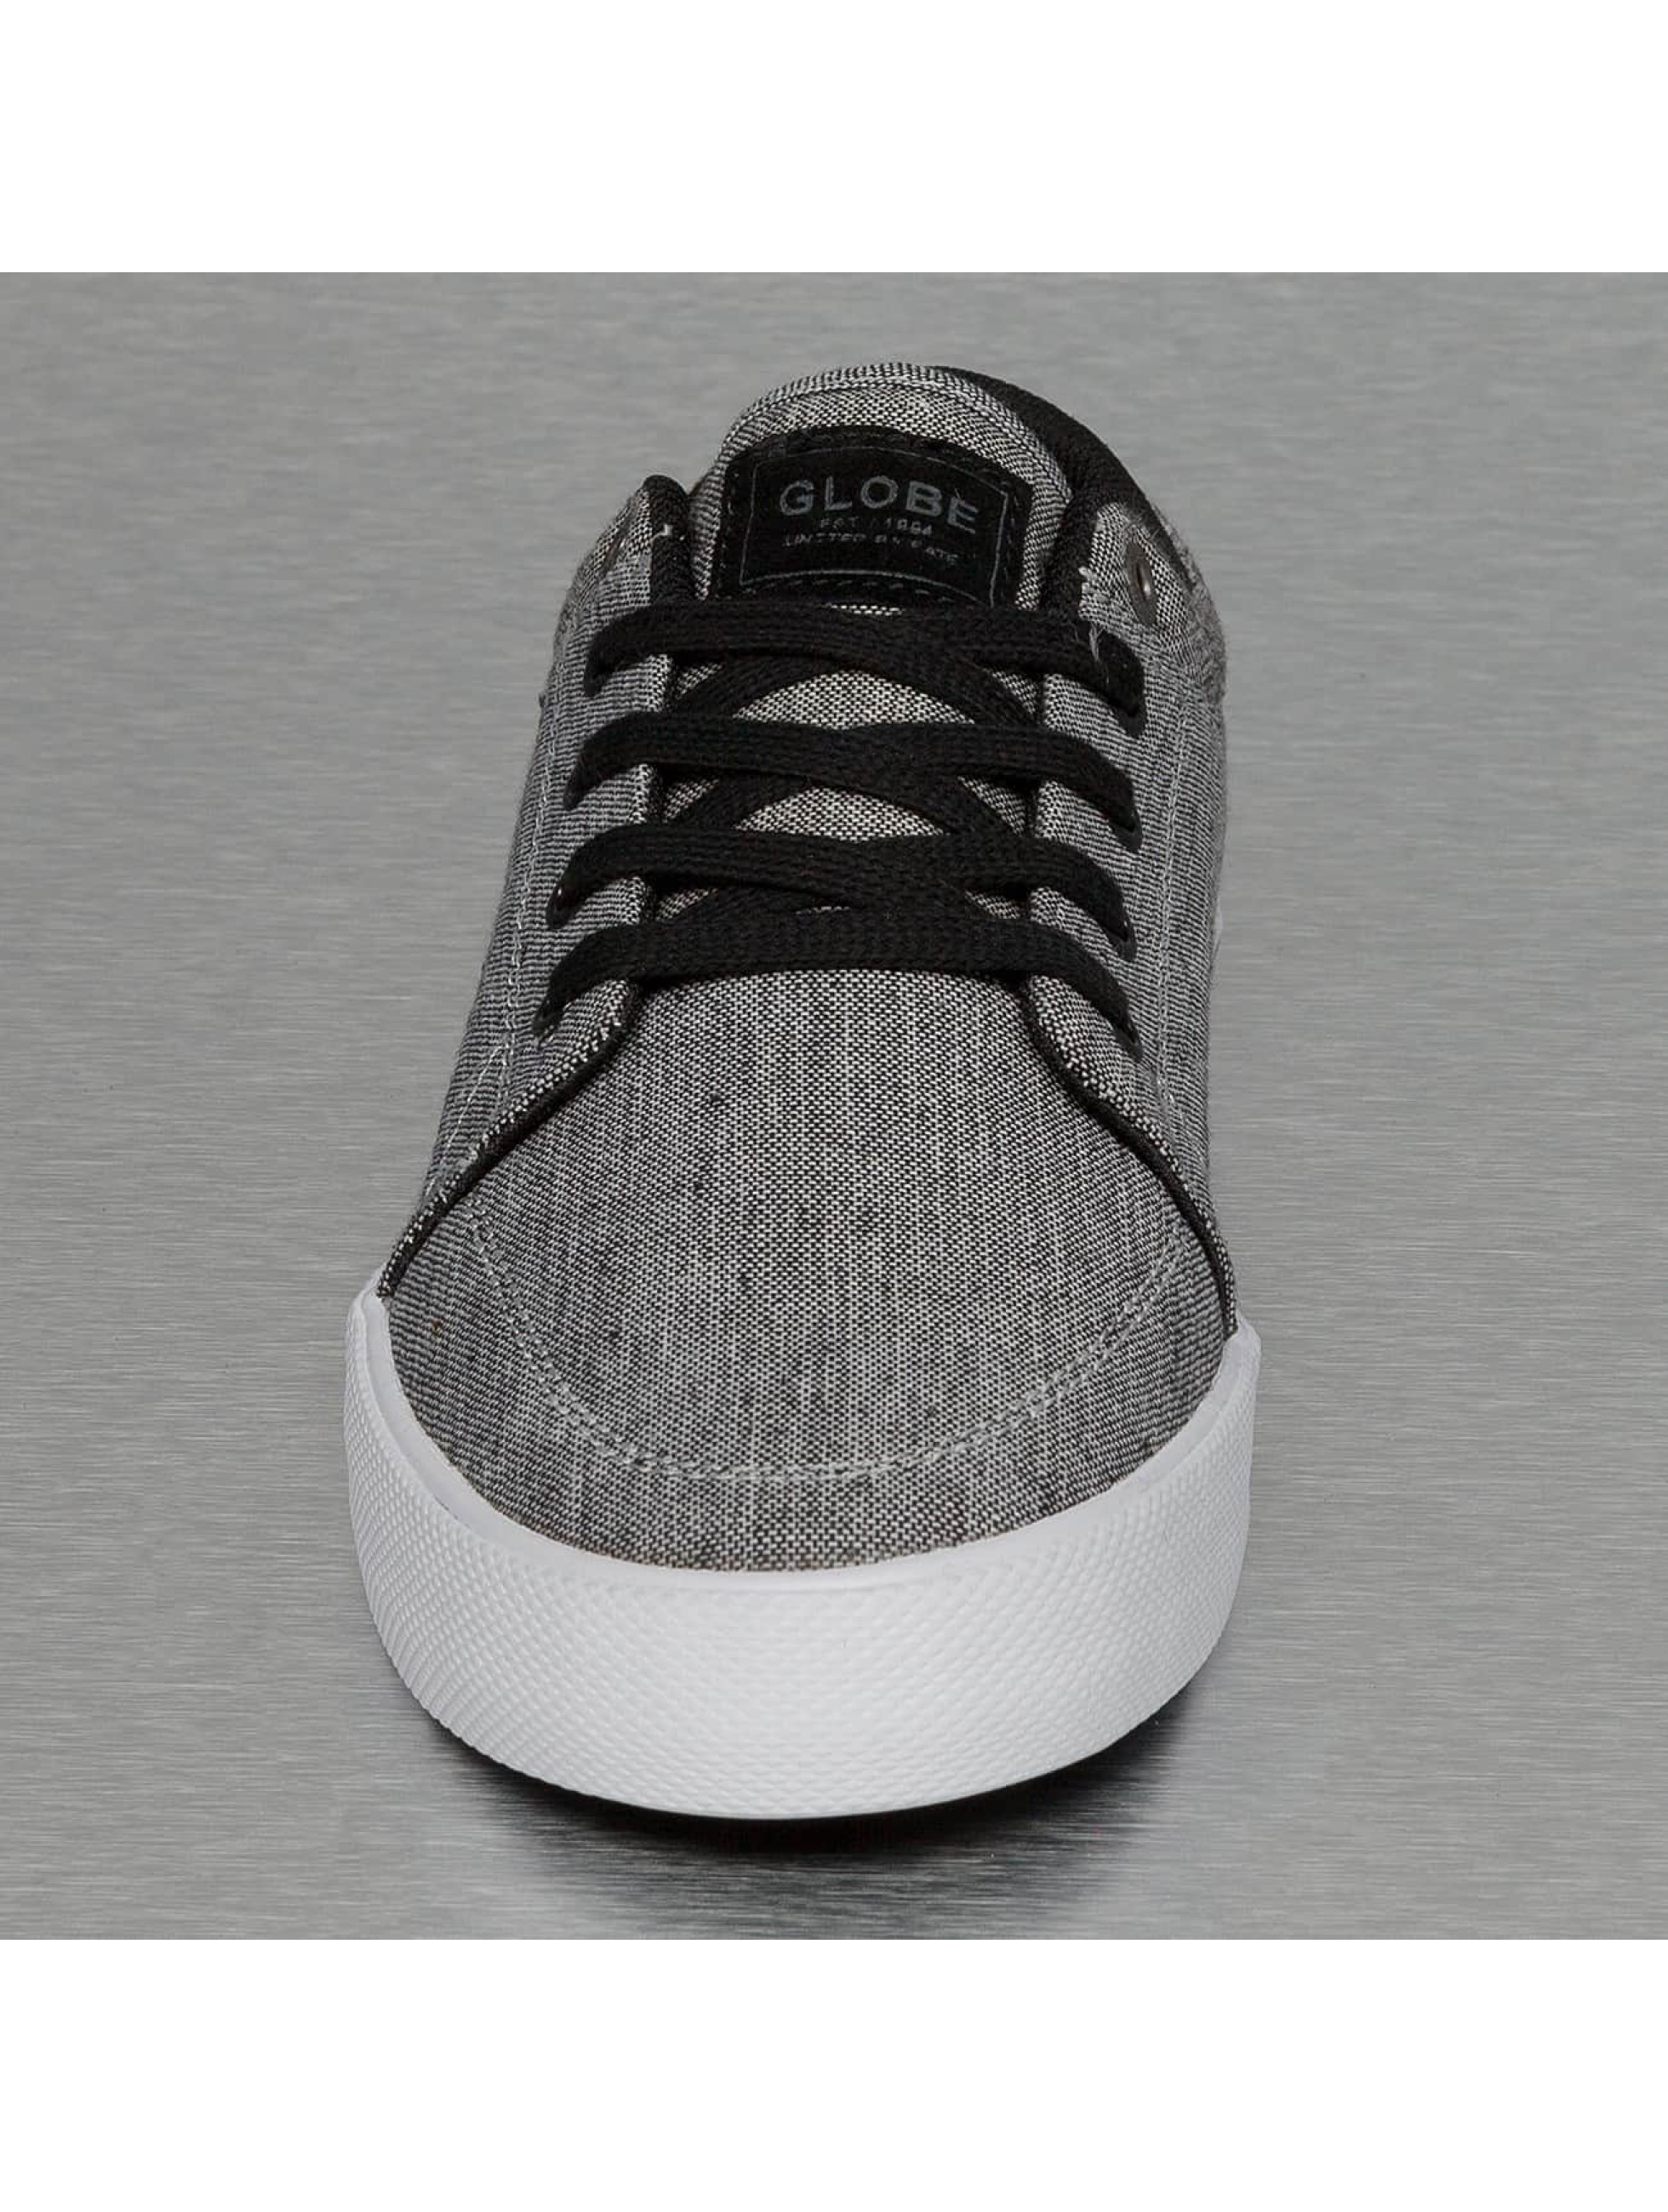 Globe Sneakers GS grey